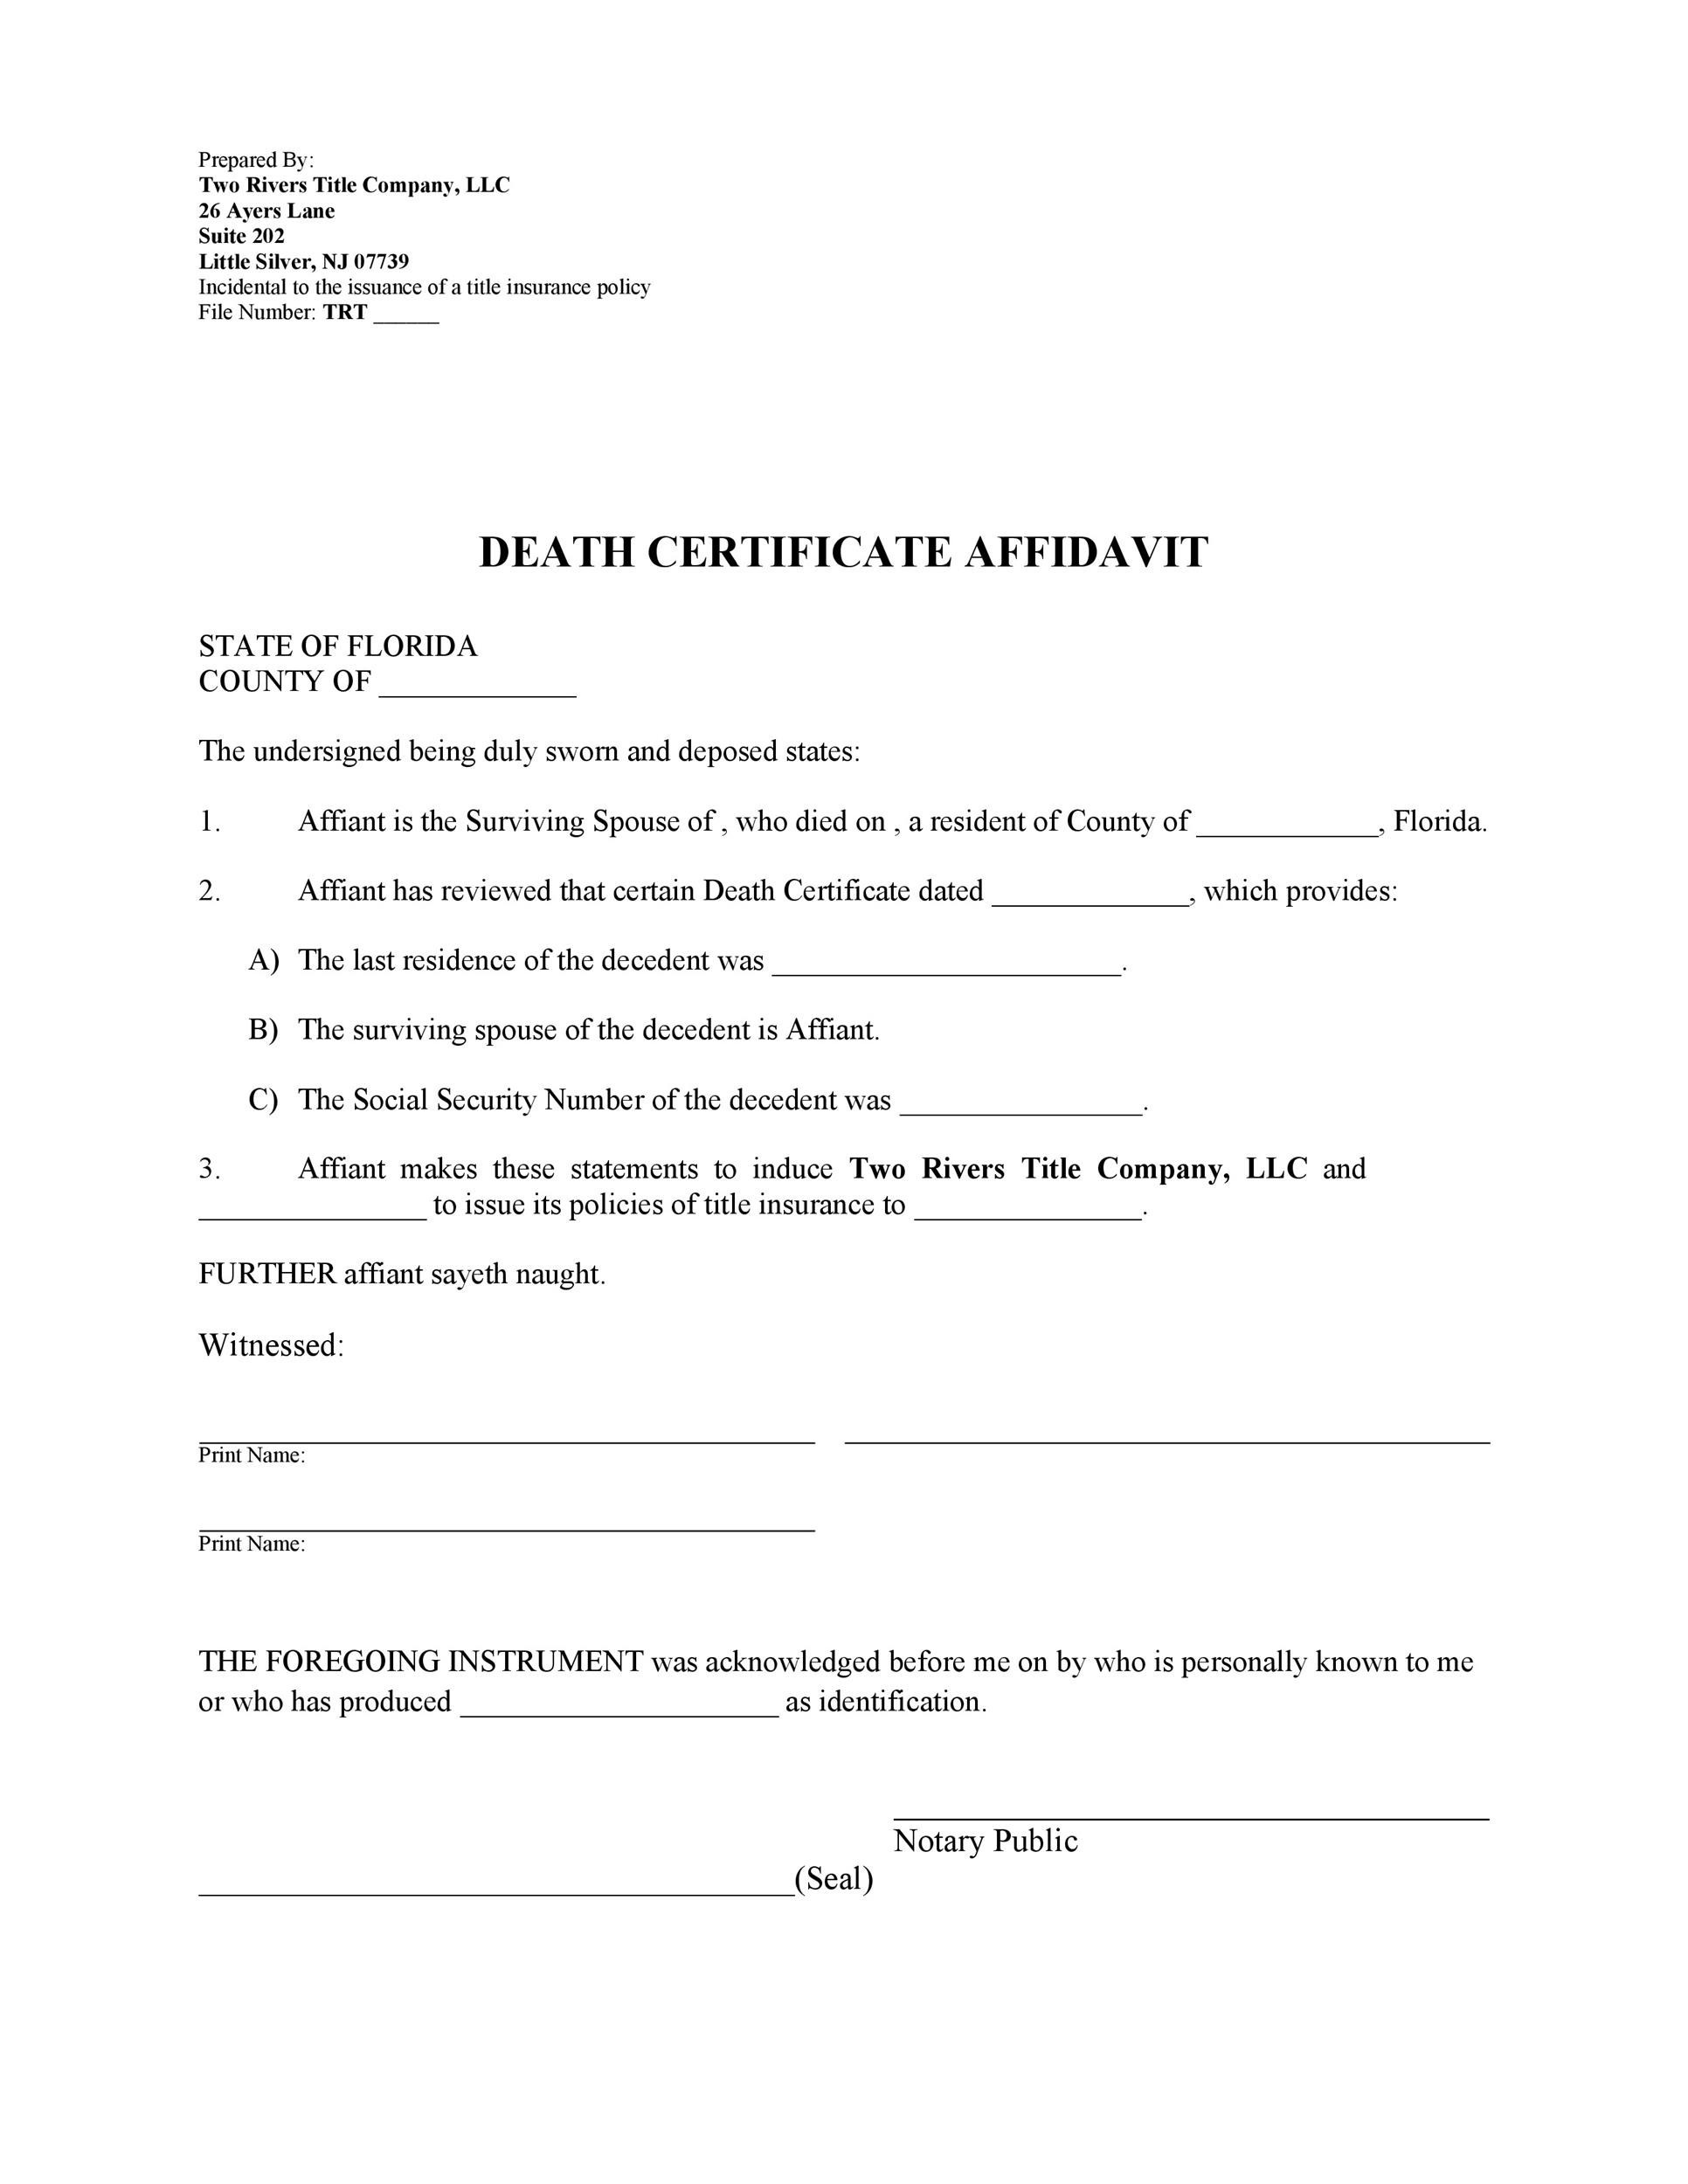 Free affidavit of death 27